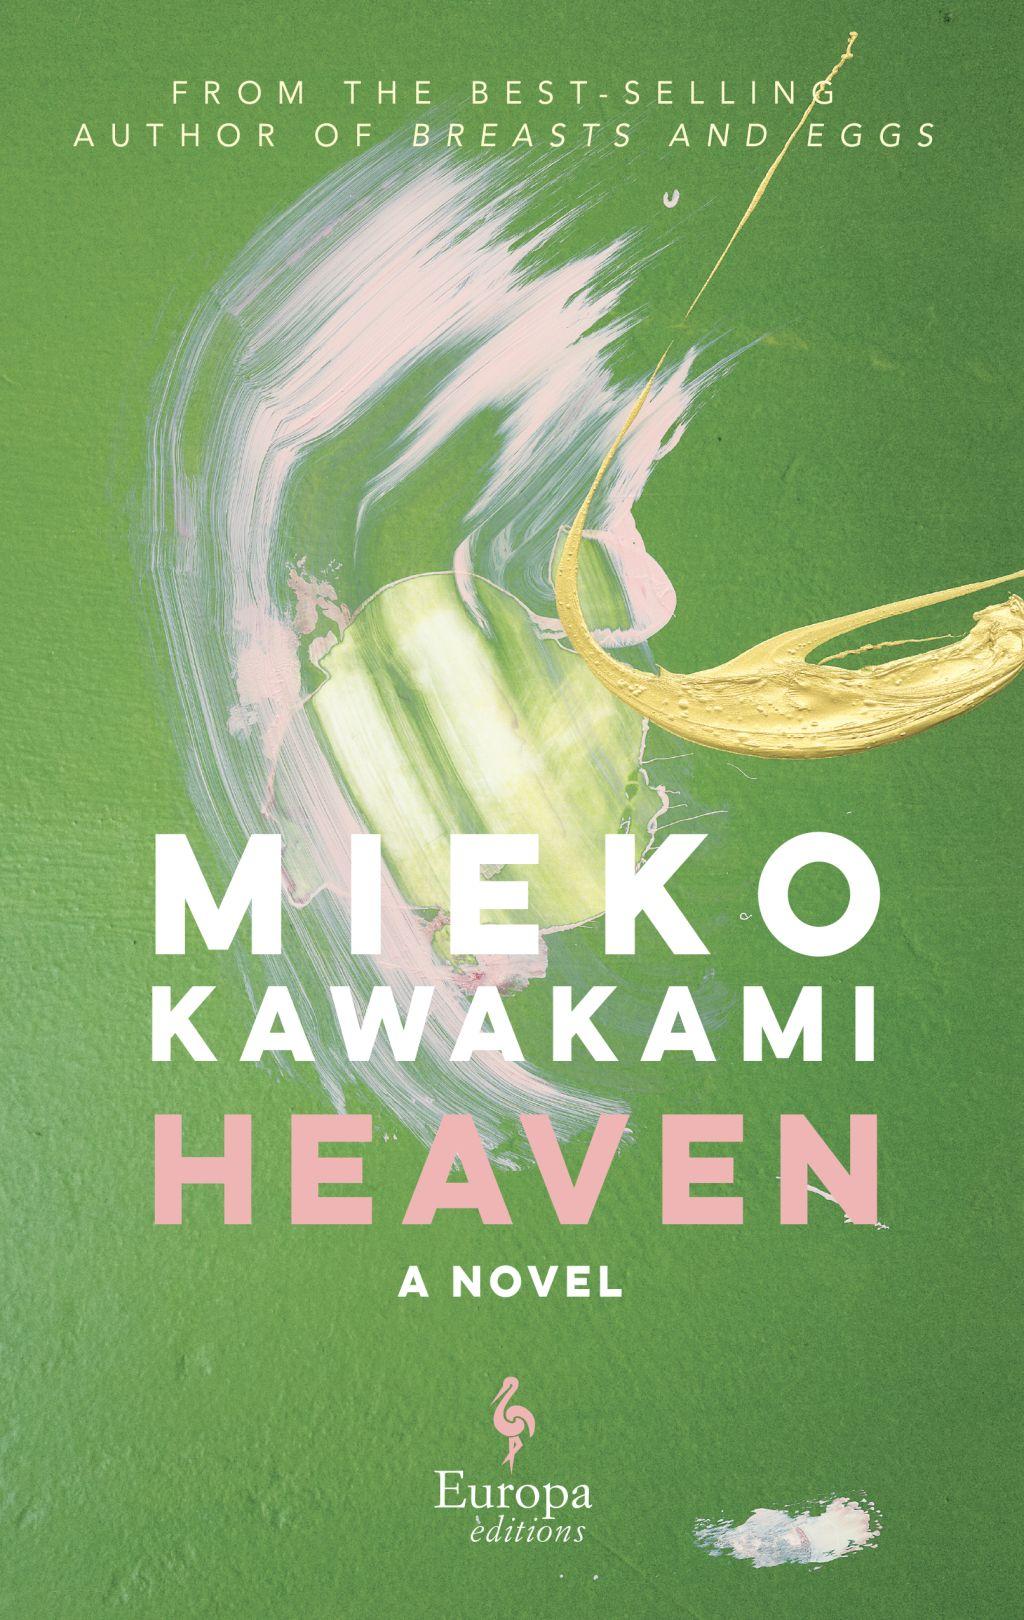 Heaven by Mieko Kawakami (Europa Editions)